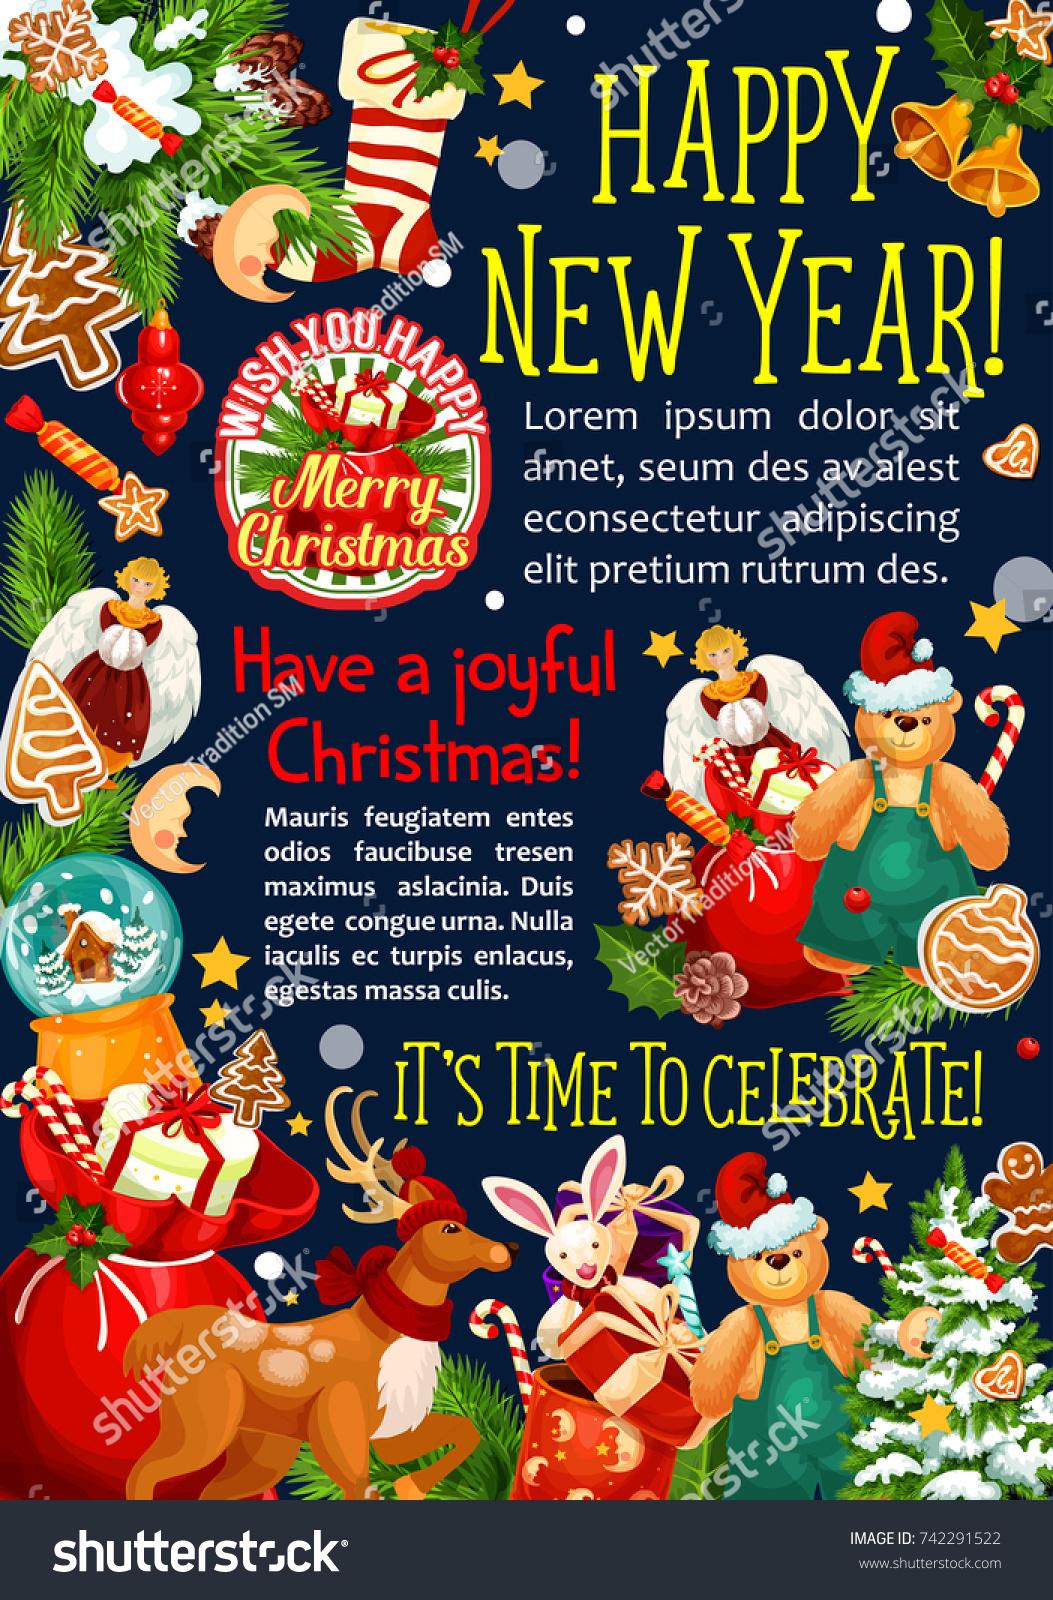 Happy New Year Christmas Season Greetings Stock Vector 742291522